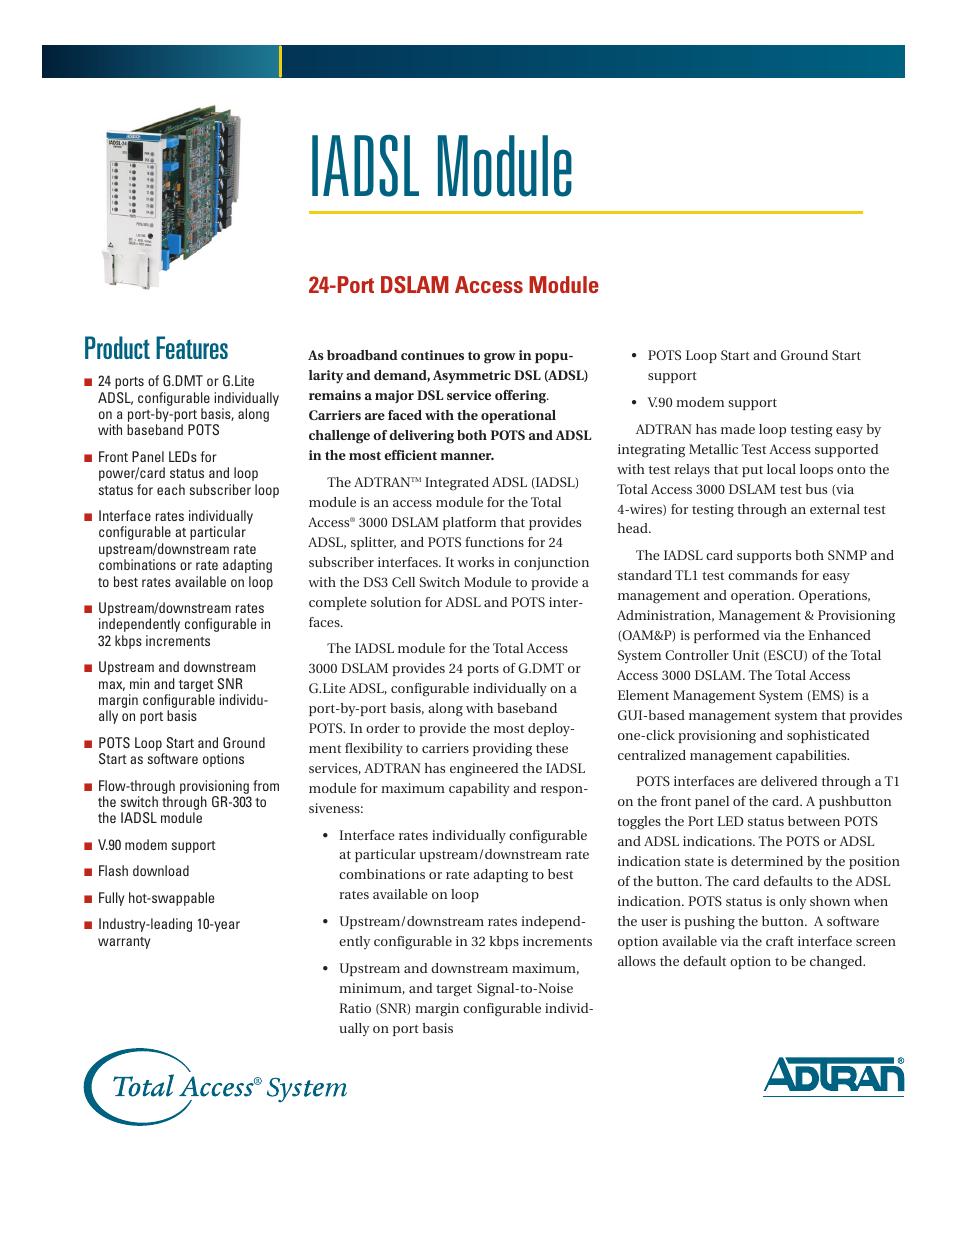 ADTRAN 24-Port DSLAM Access Module IADSL Module User Manual